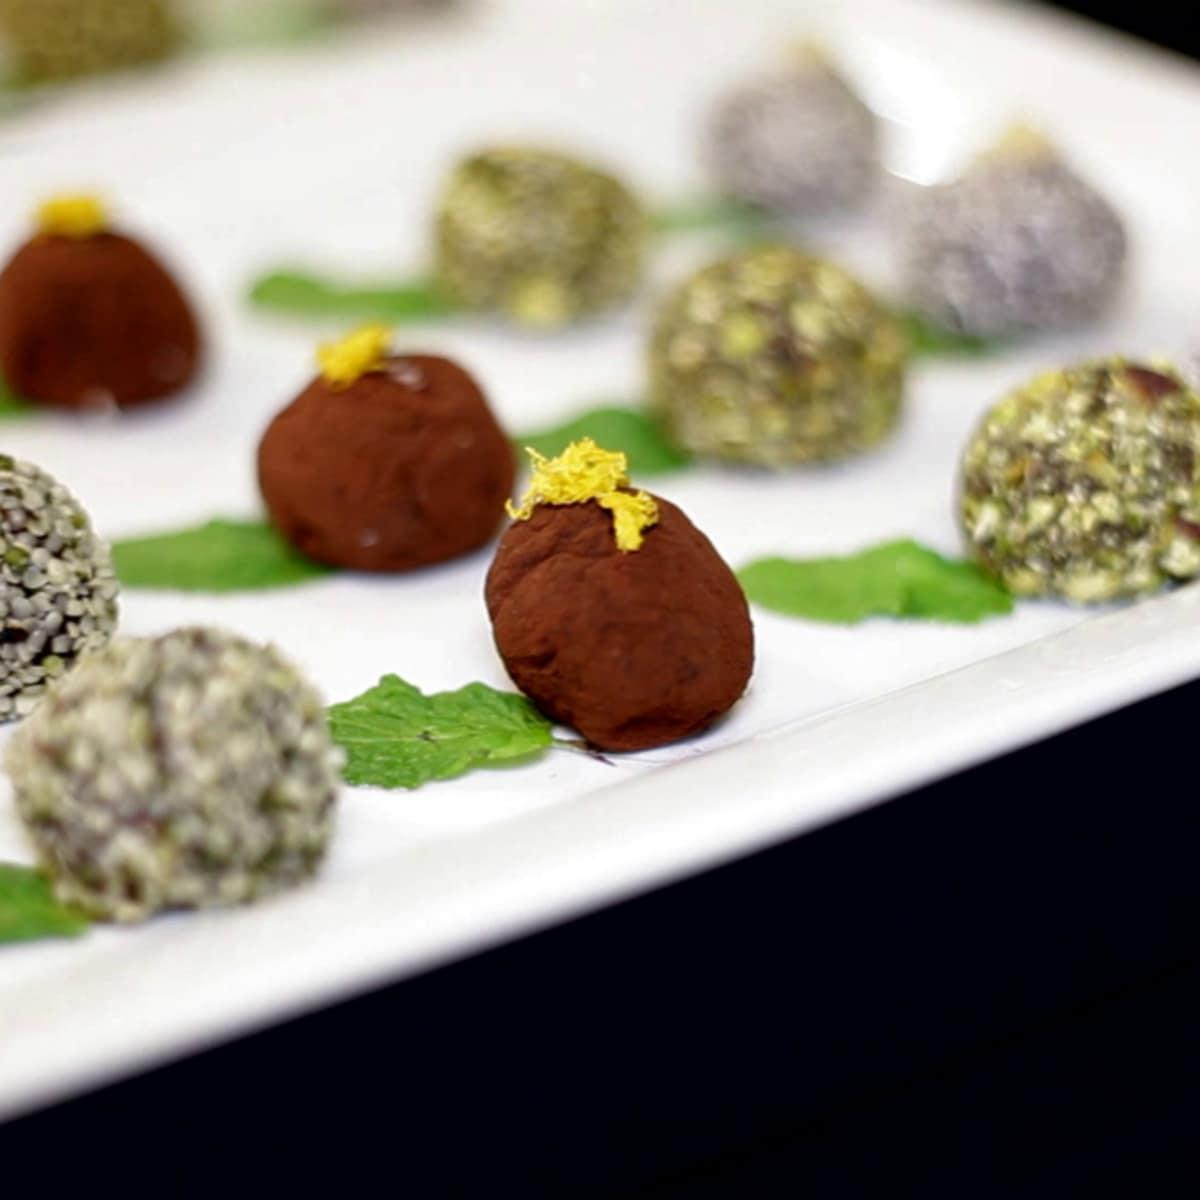 The Natural Epicurean raw chocolate vegan